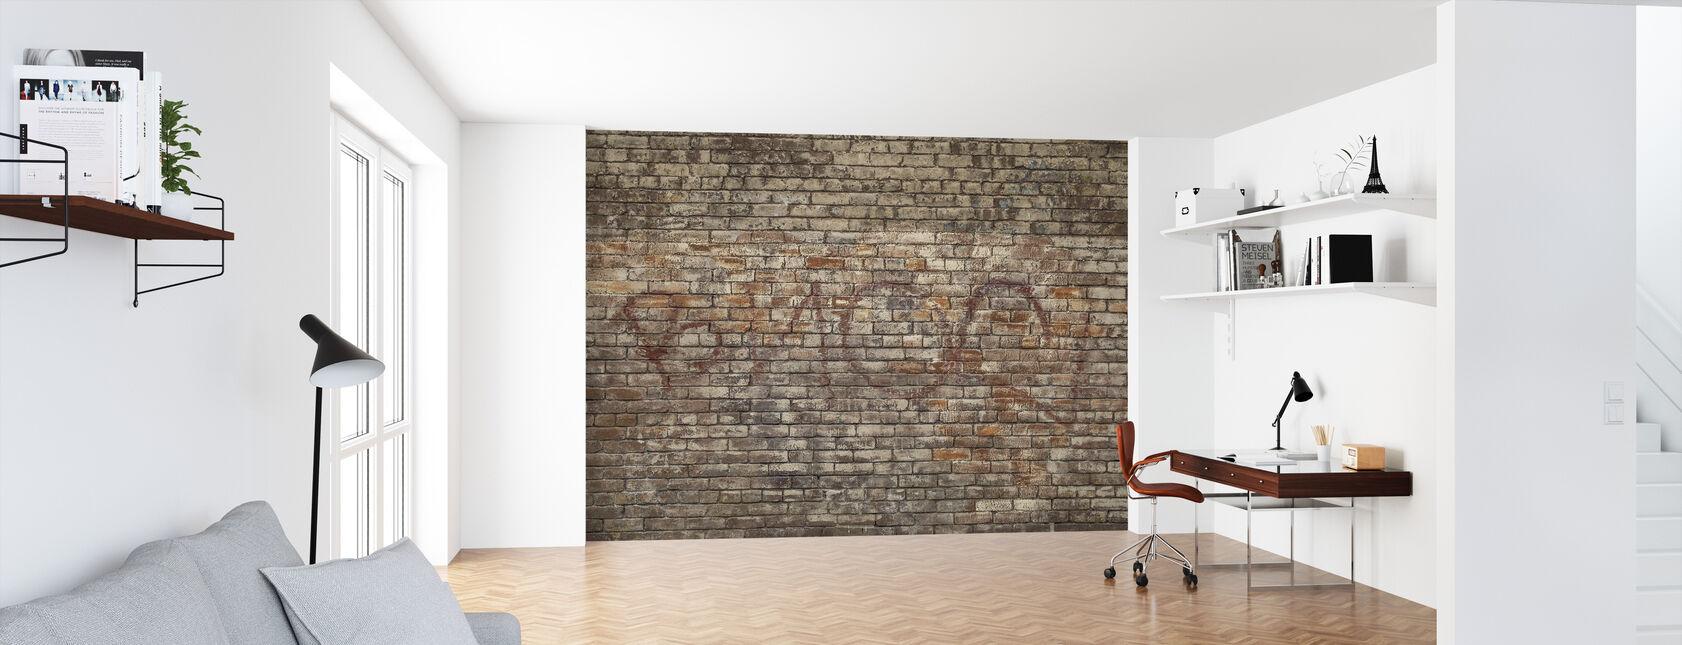 Tegelvägg Graffiti - Tapet - Kontor